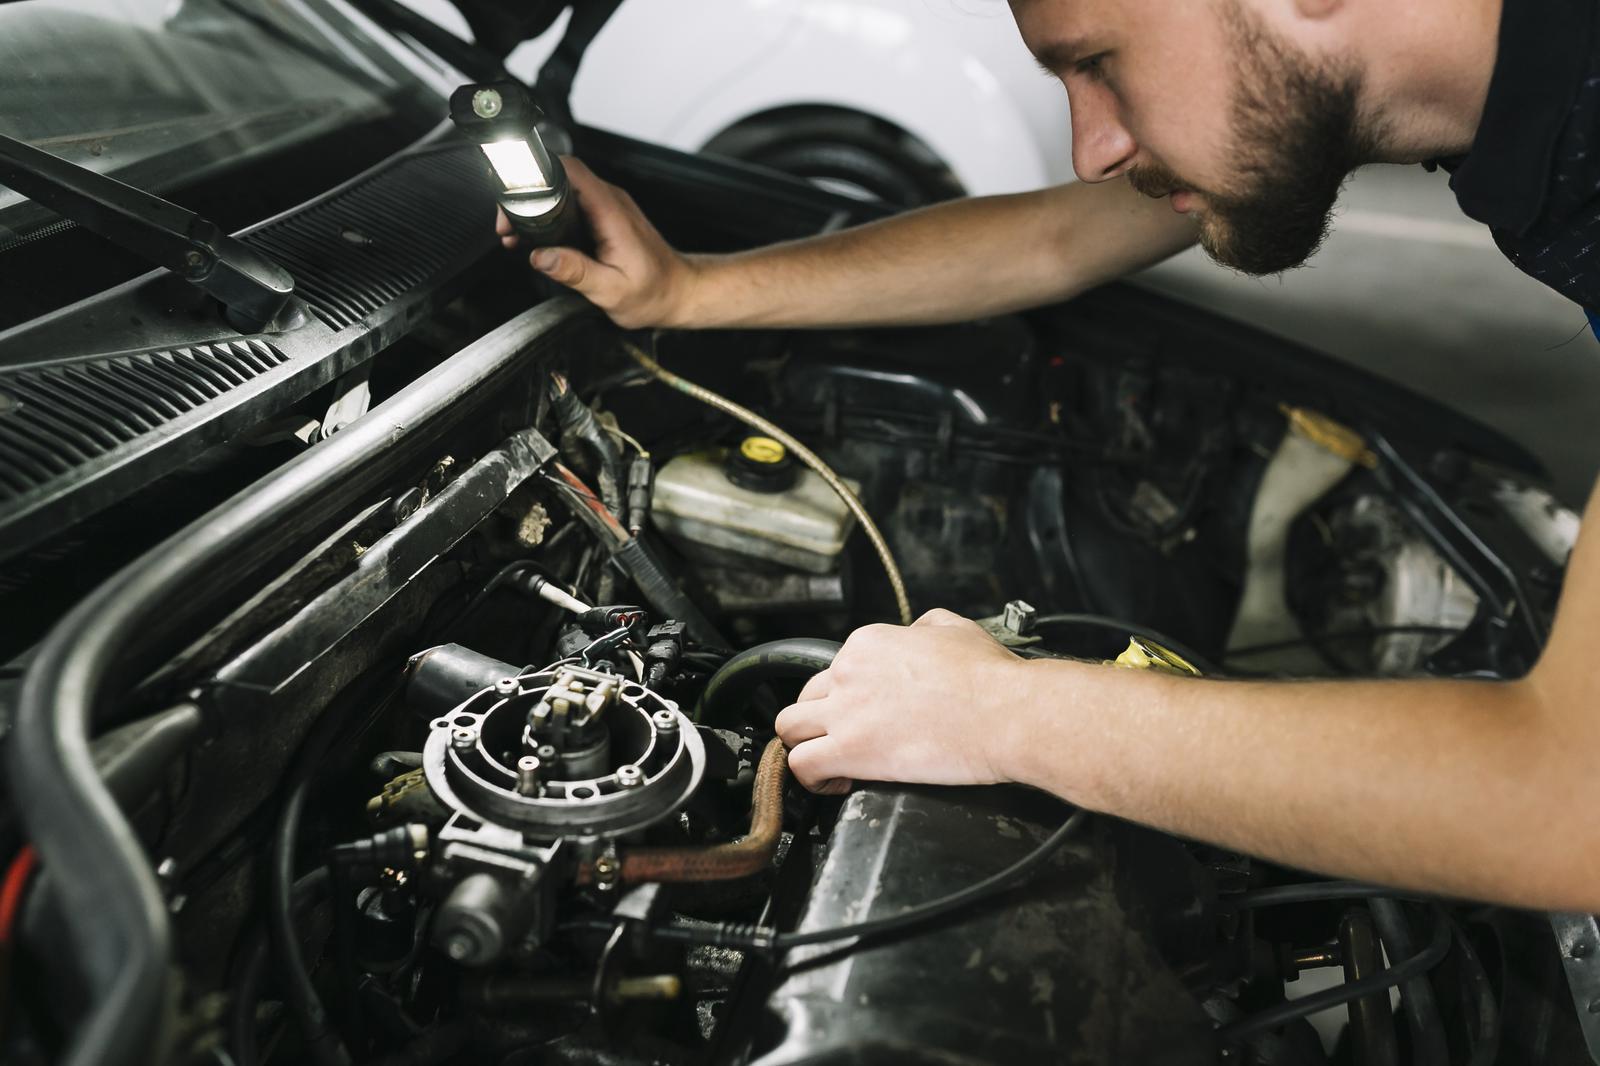 Maintenance and repair of motor vehicles in Tallinn